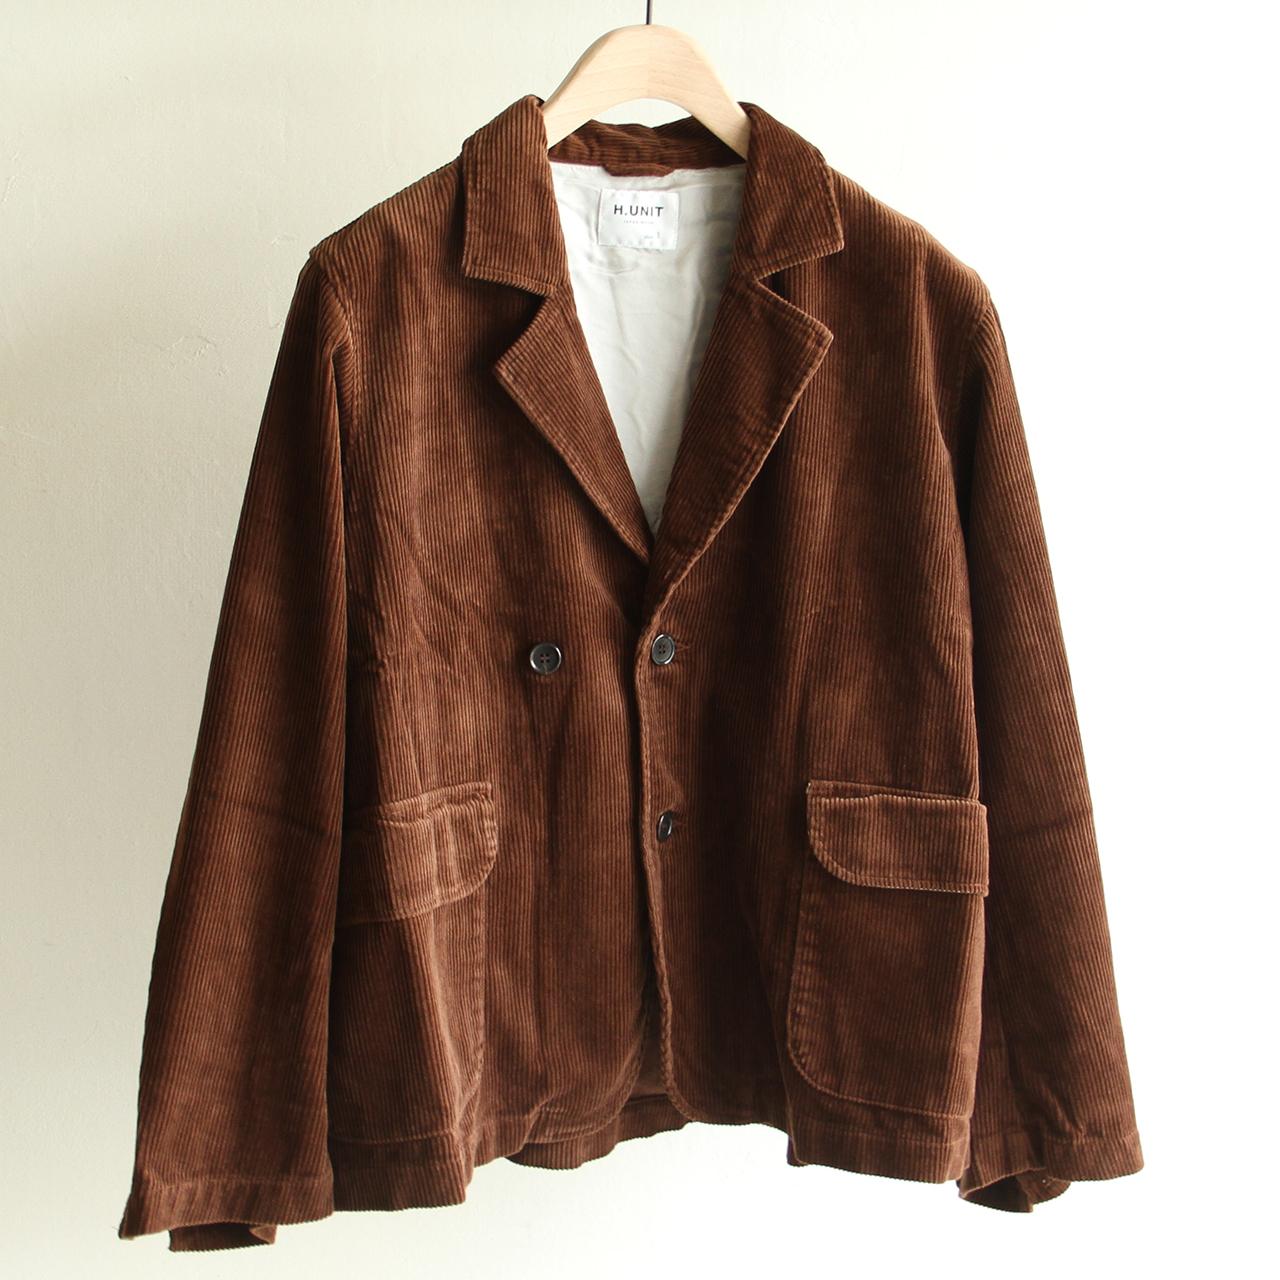 H.UNIT【 mens 】corduroy easy jacket